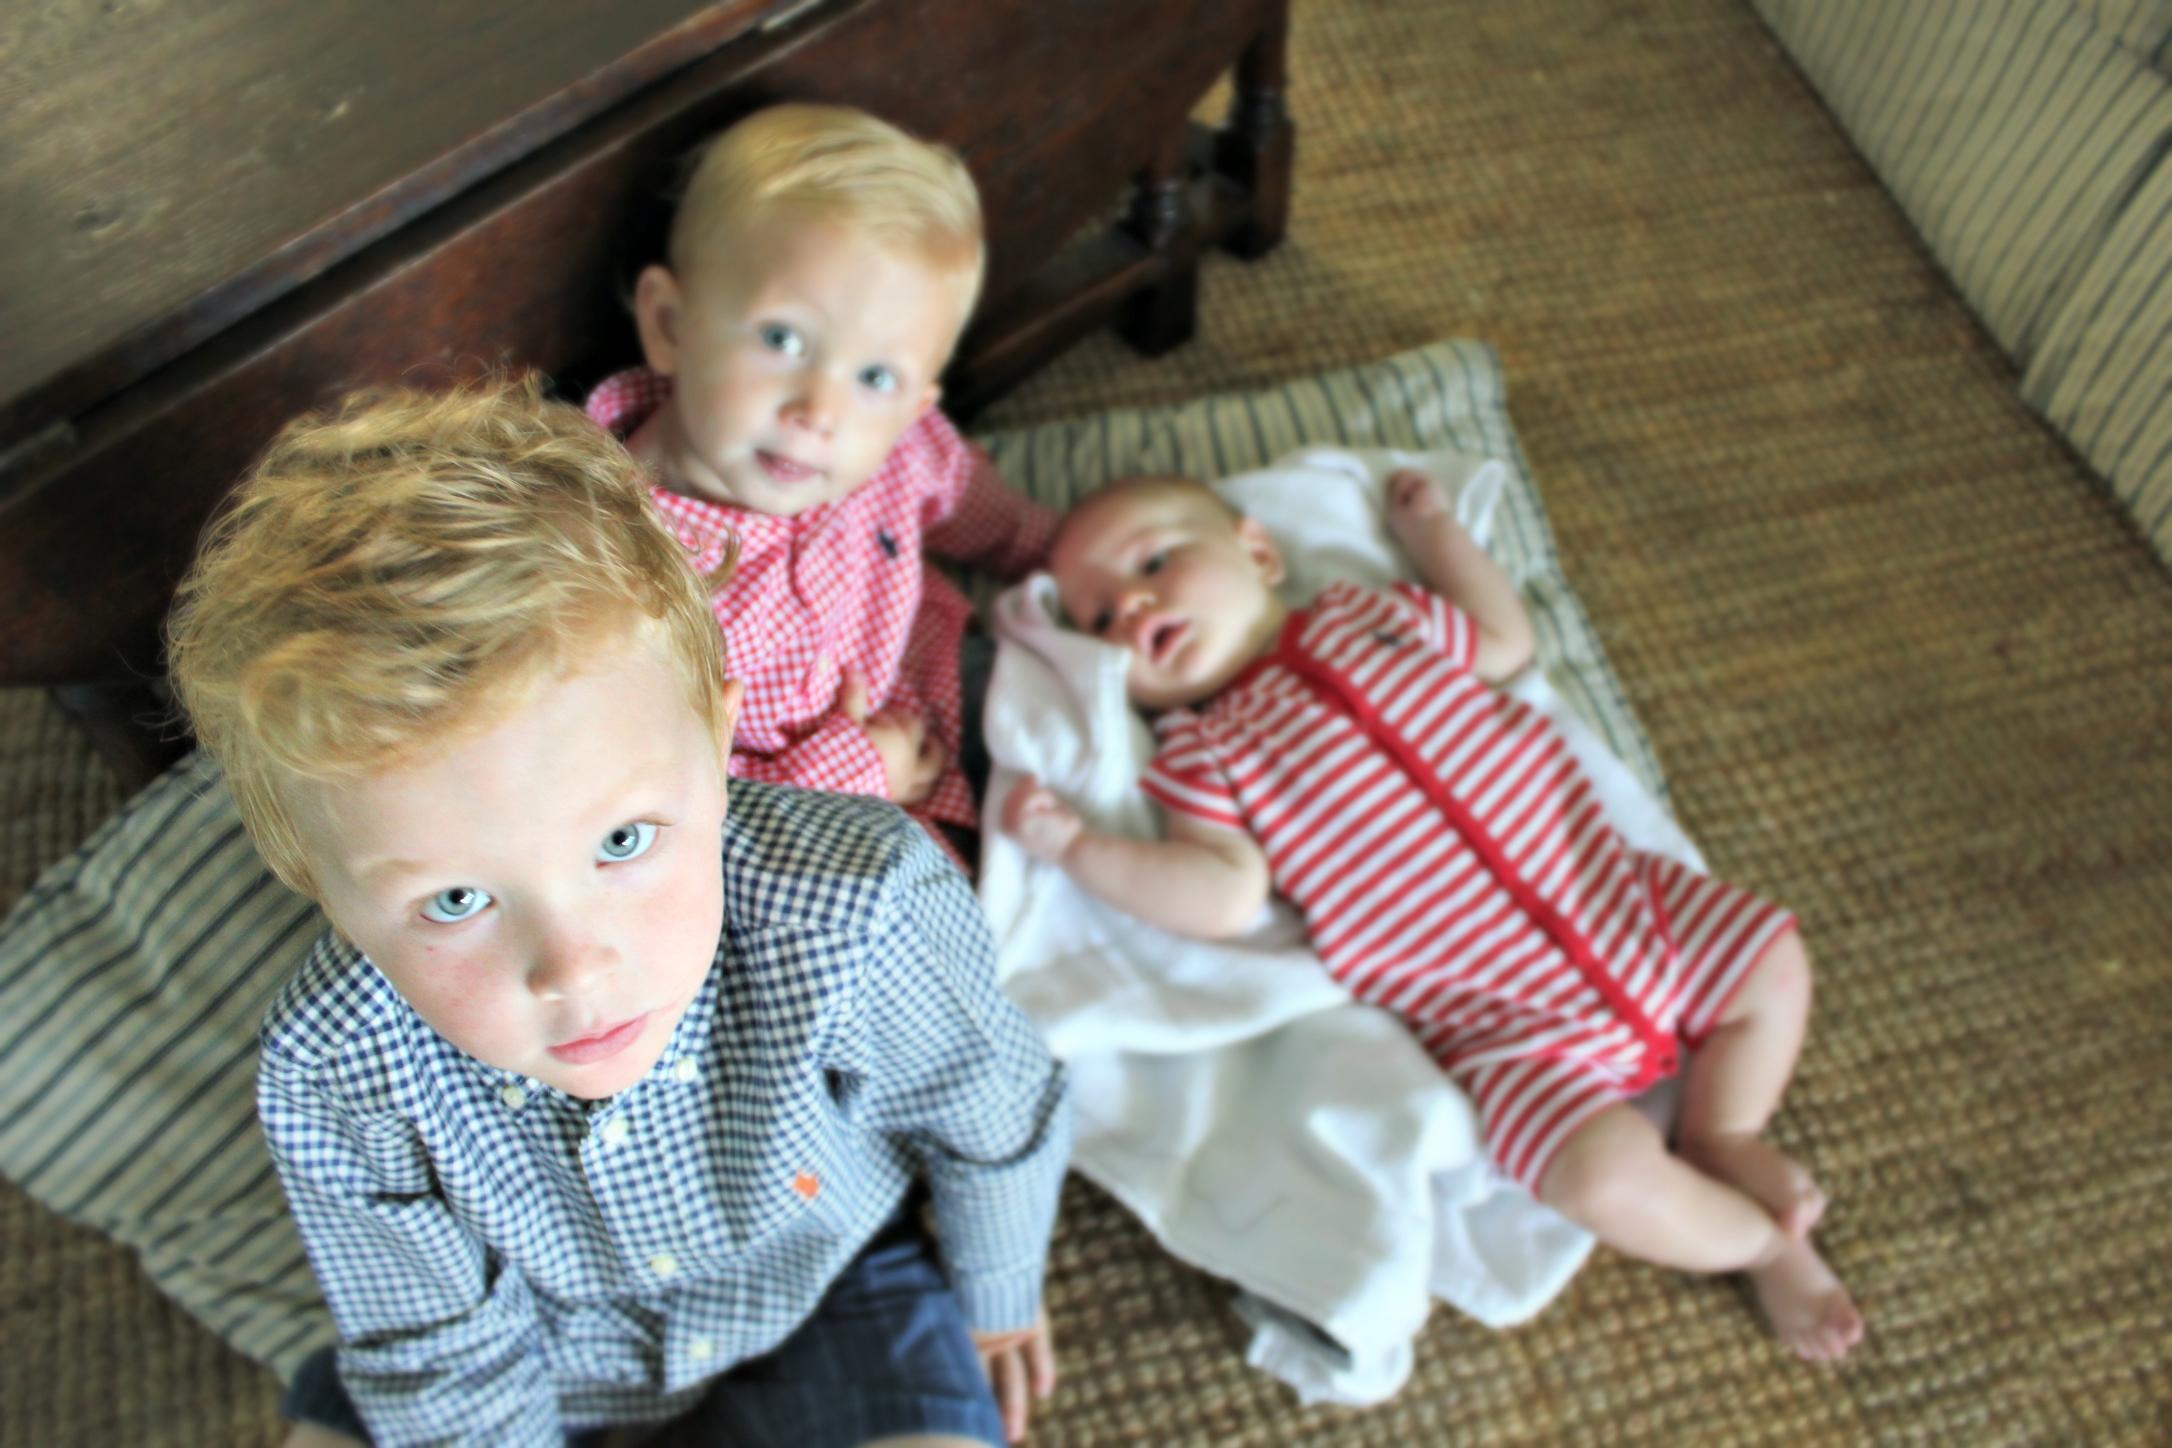 11 Ridiculous Reasons My Kids Have Woken Me Up SheJustGlows.com